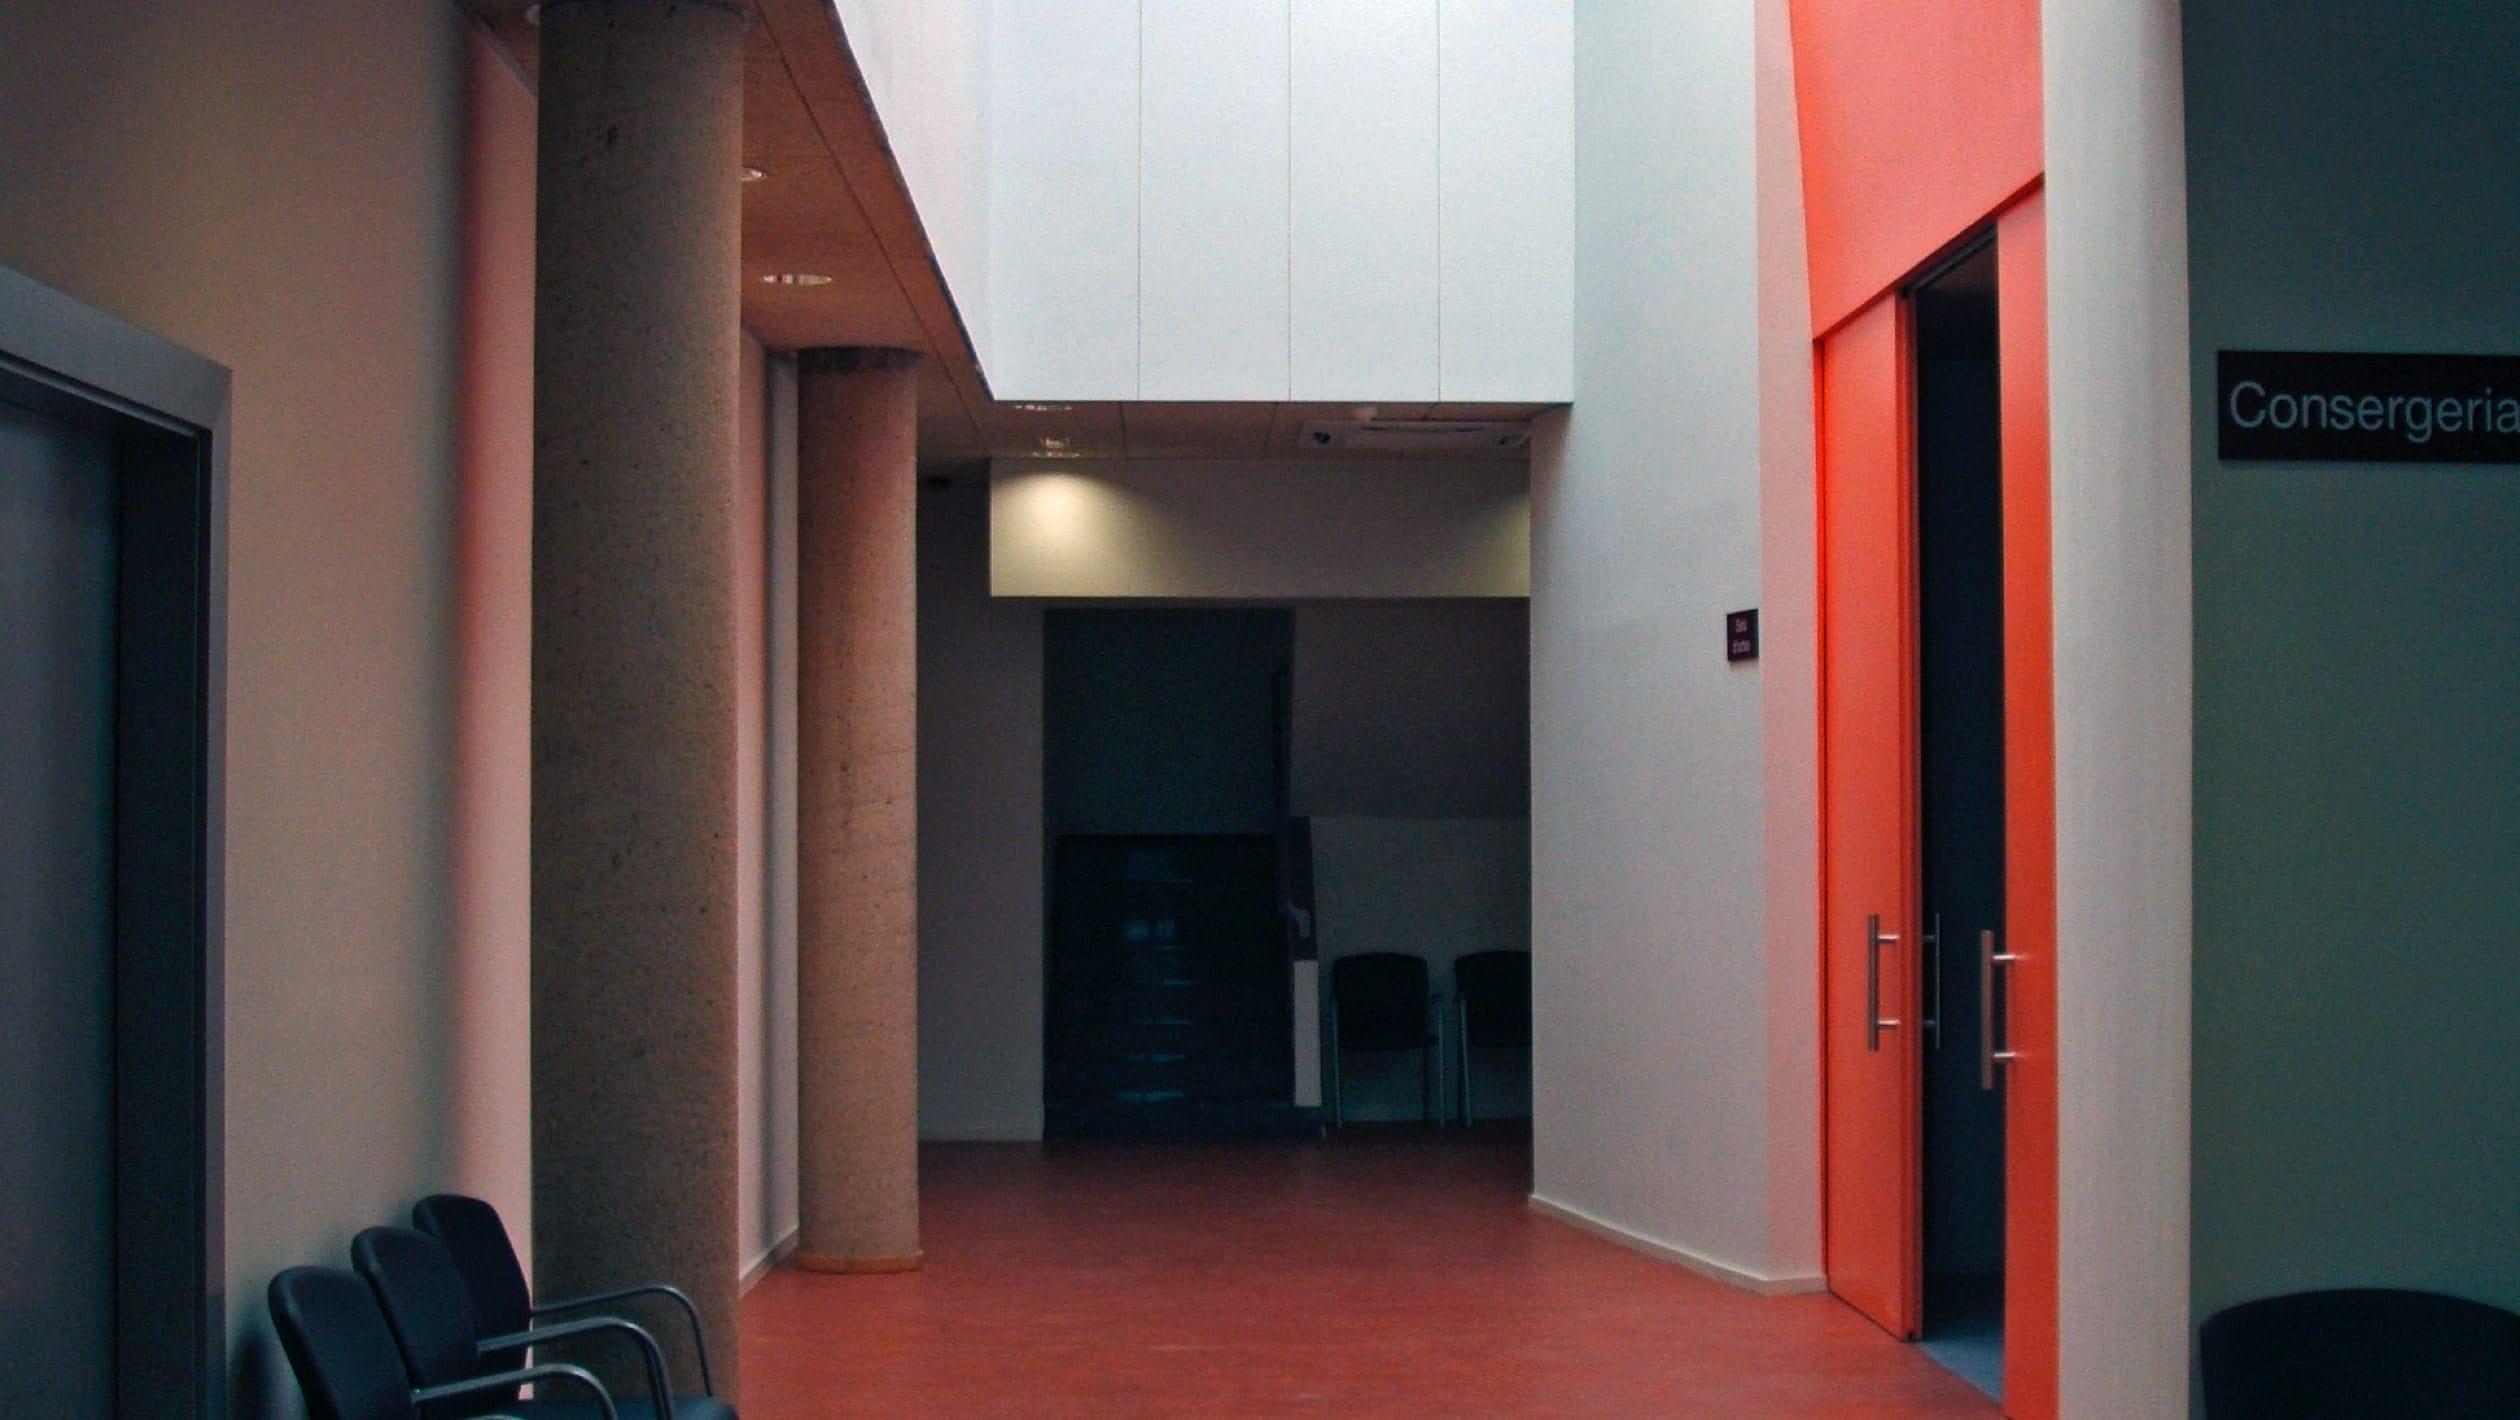 Conservatorio de Granollers